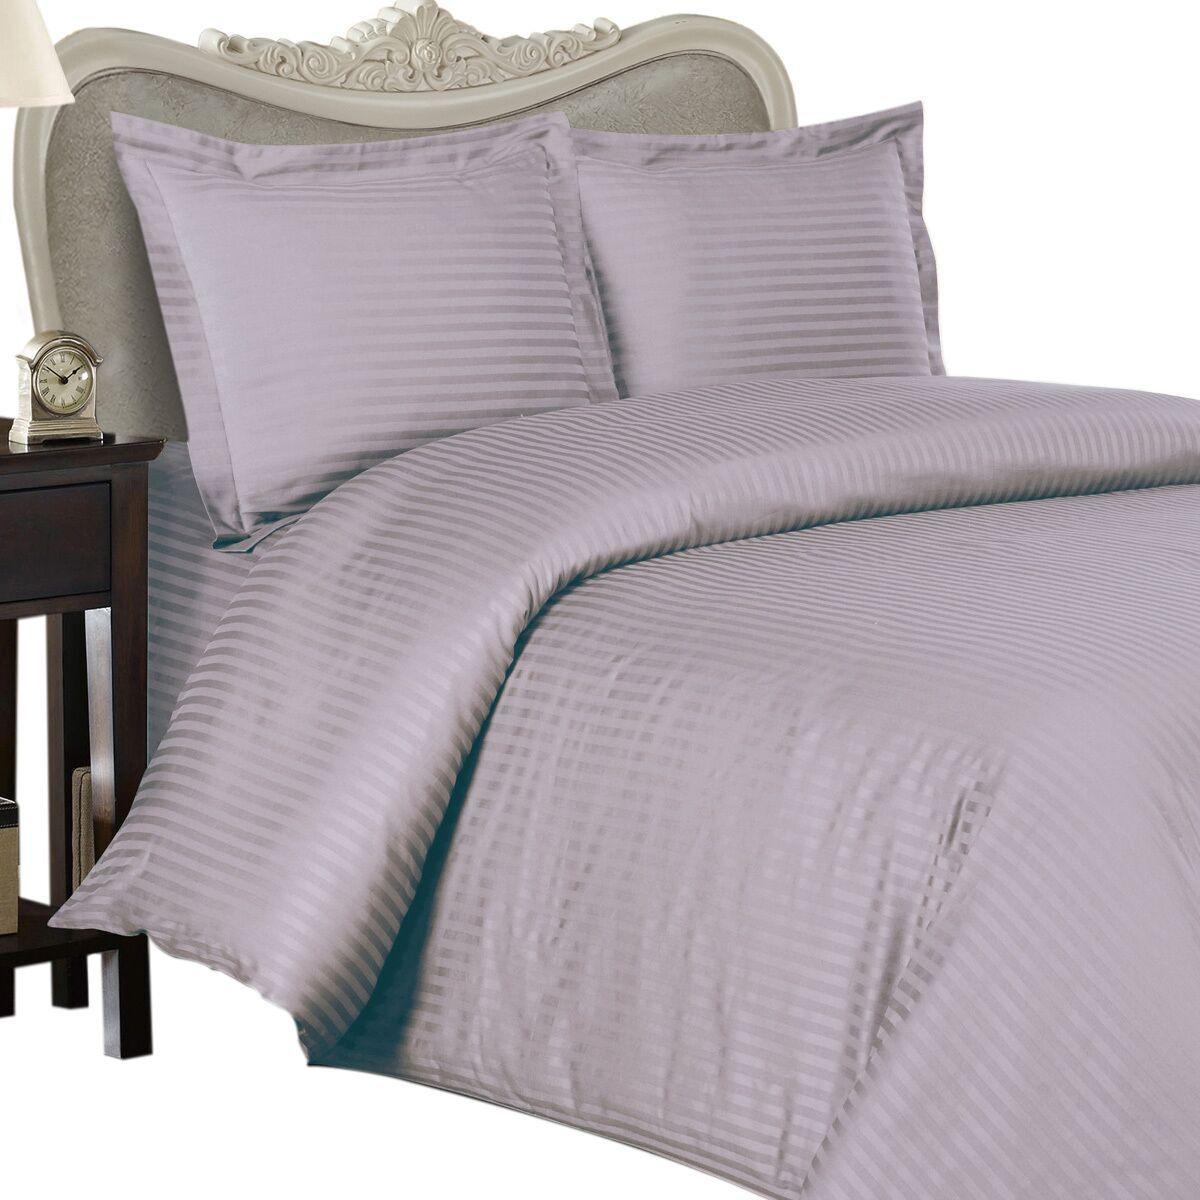 1200 Thread Count 100% Egyptian Cotton Sheet Set 1200 TC KING Lavender Stripe